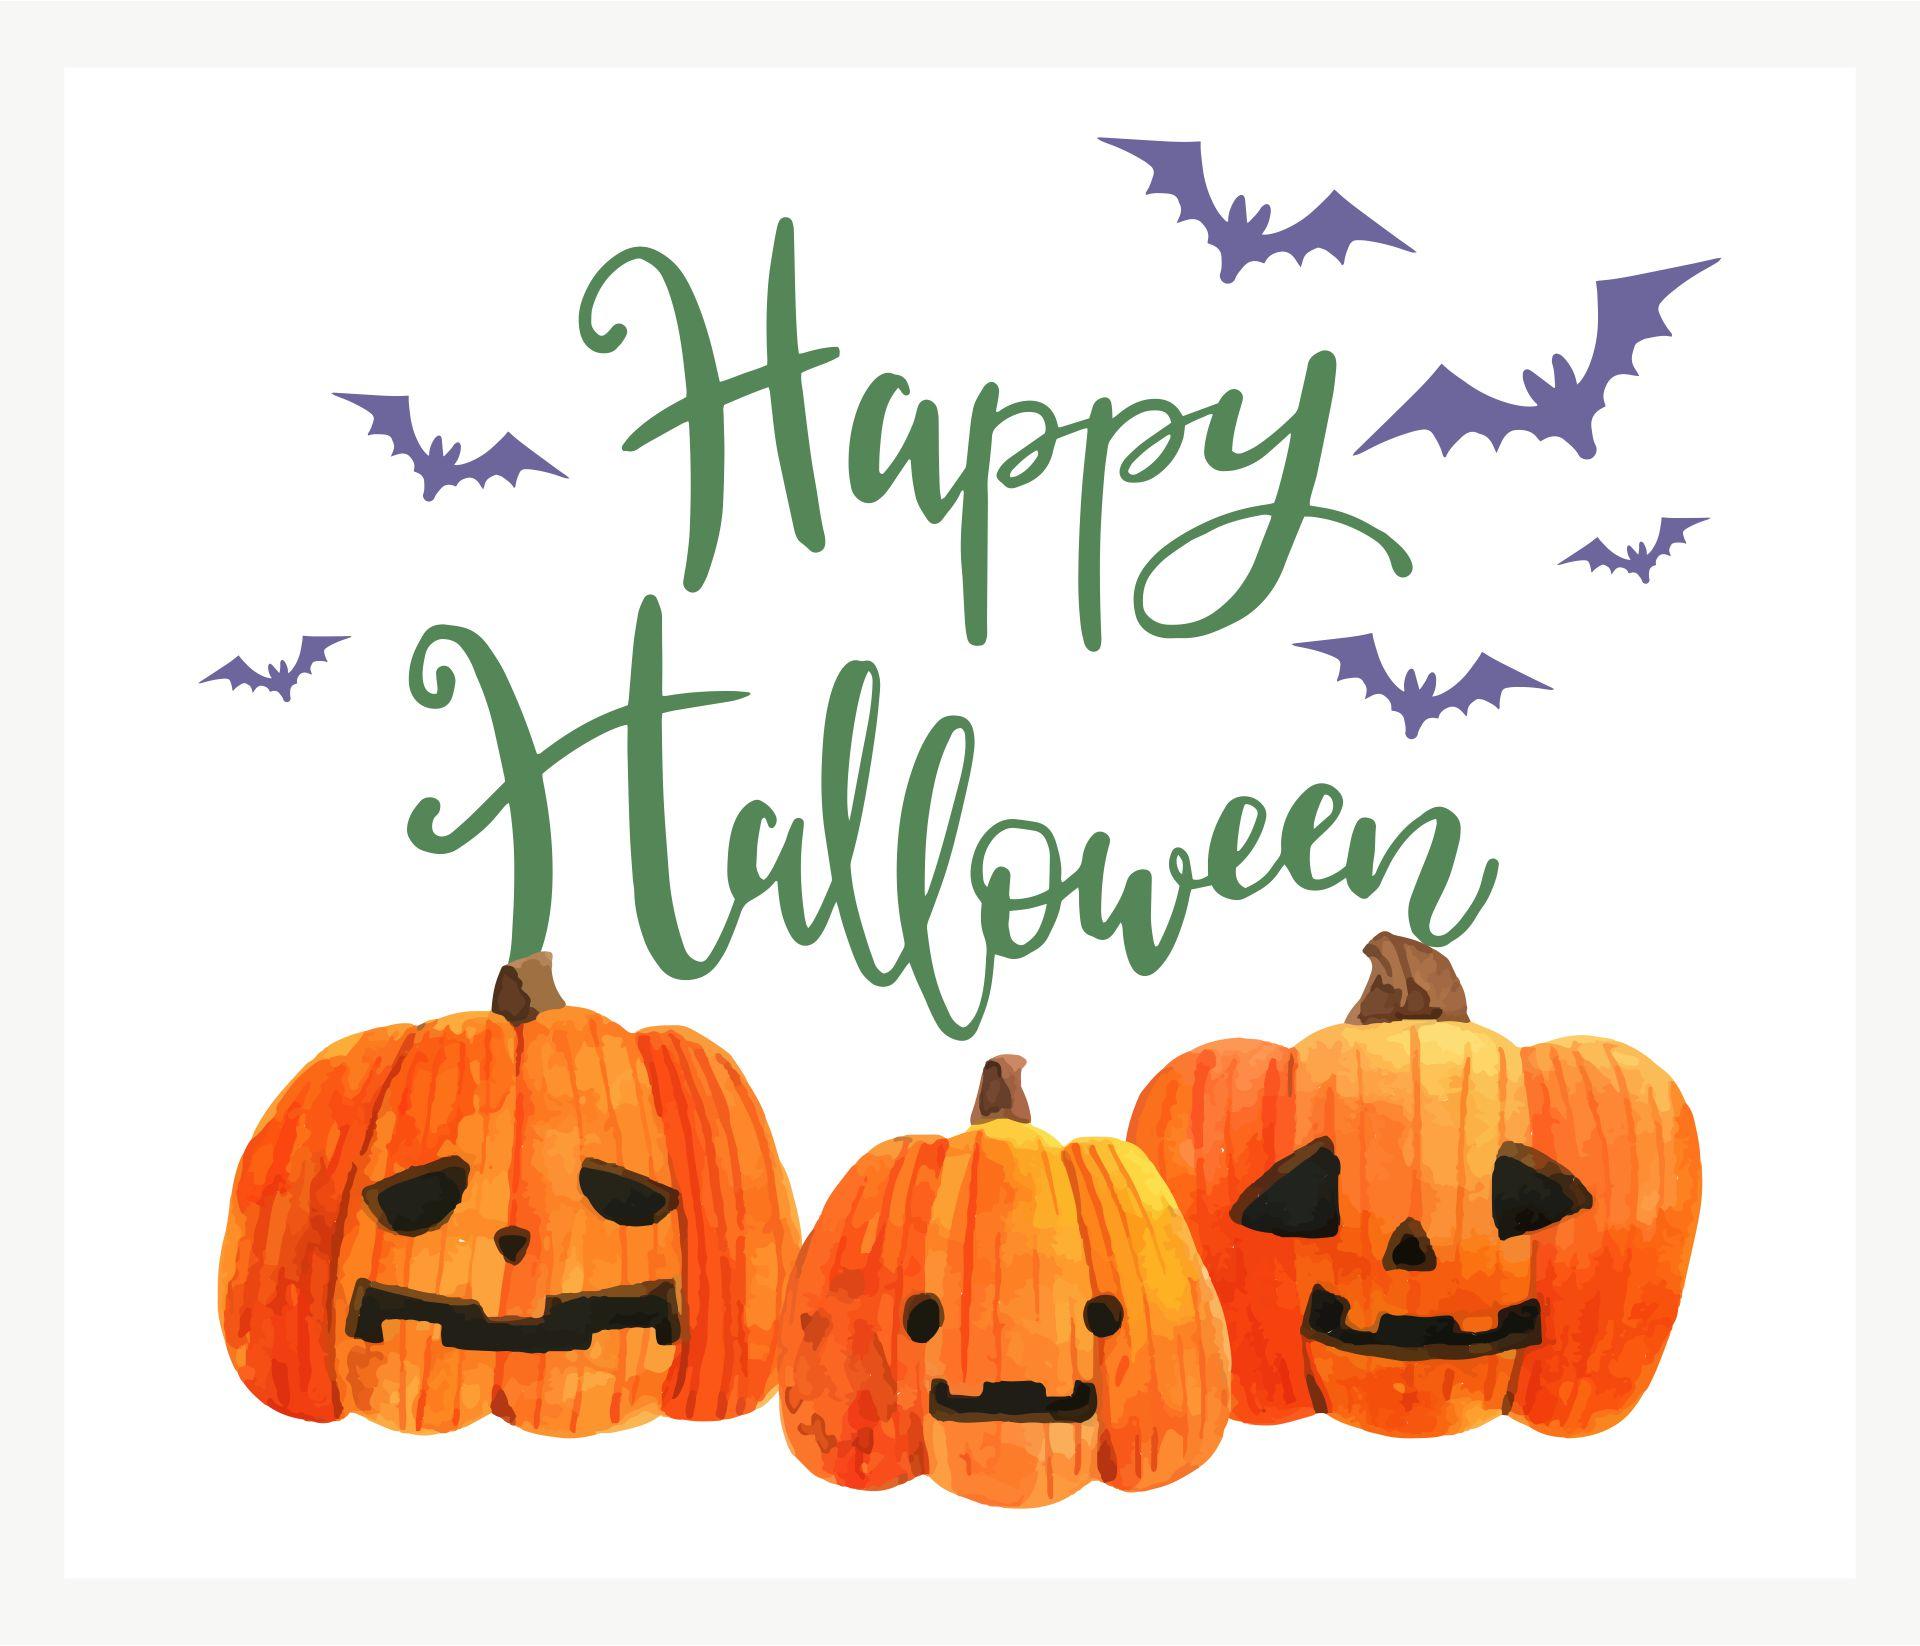 Happy Halloween Greeting Card With Three Jack-O-Lanterns